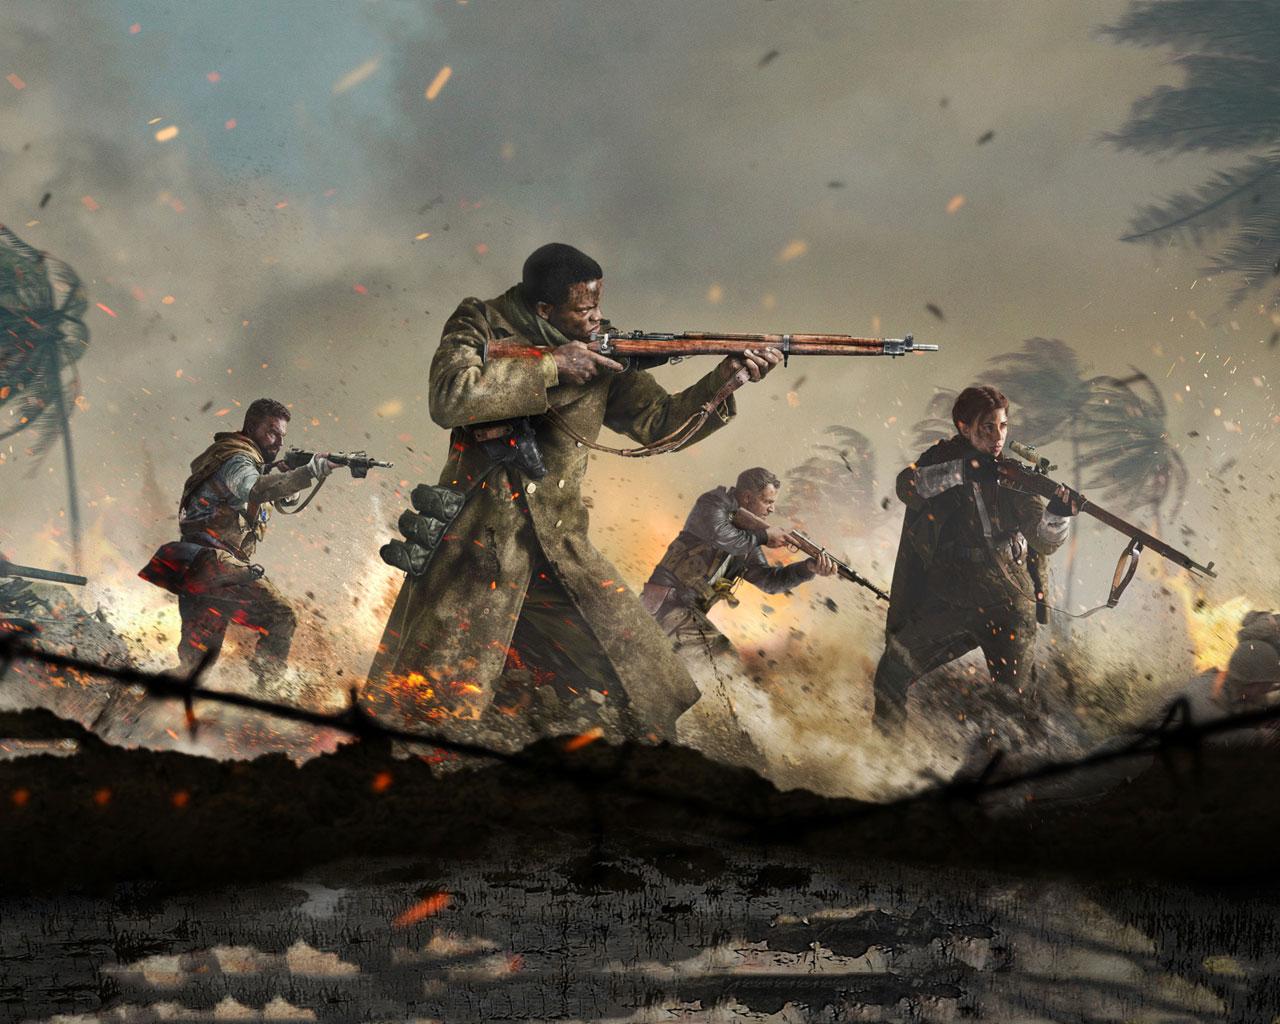 Free Call of Duty: Vanguard Wallpaper in 1280x1024